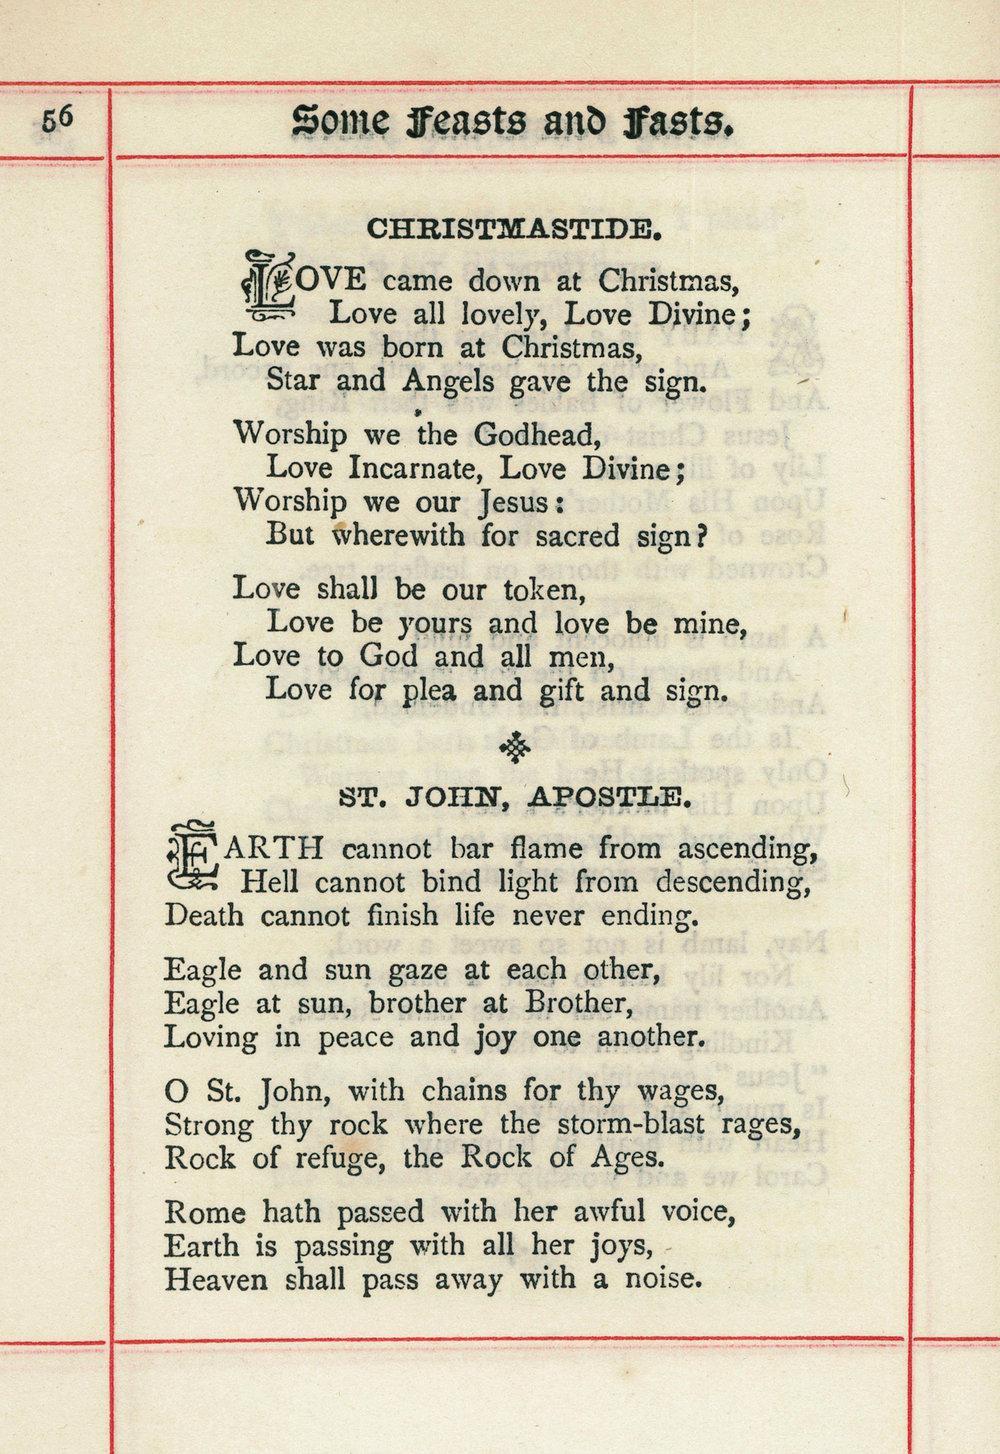 Fig. 2.  Christina Rossetti,  Verses  (London: SPCK, 1893).